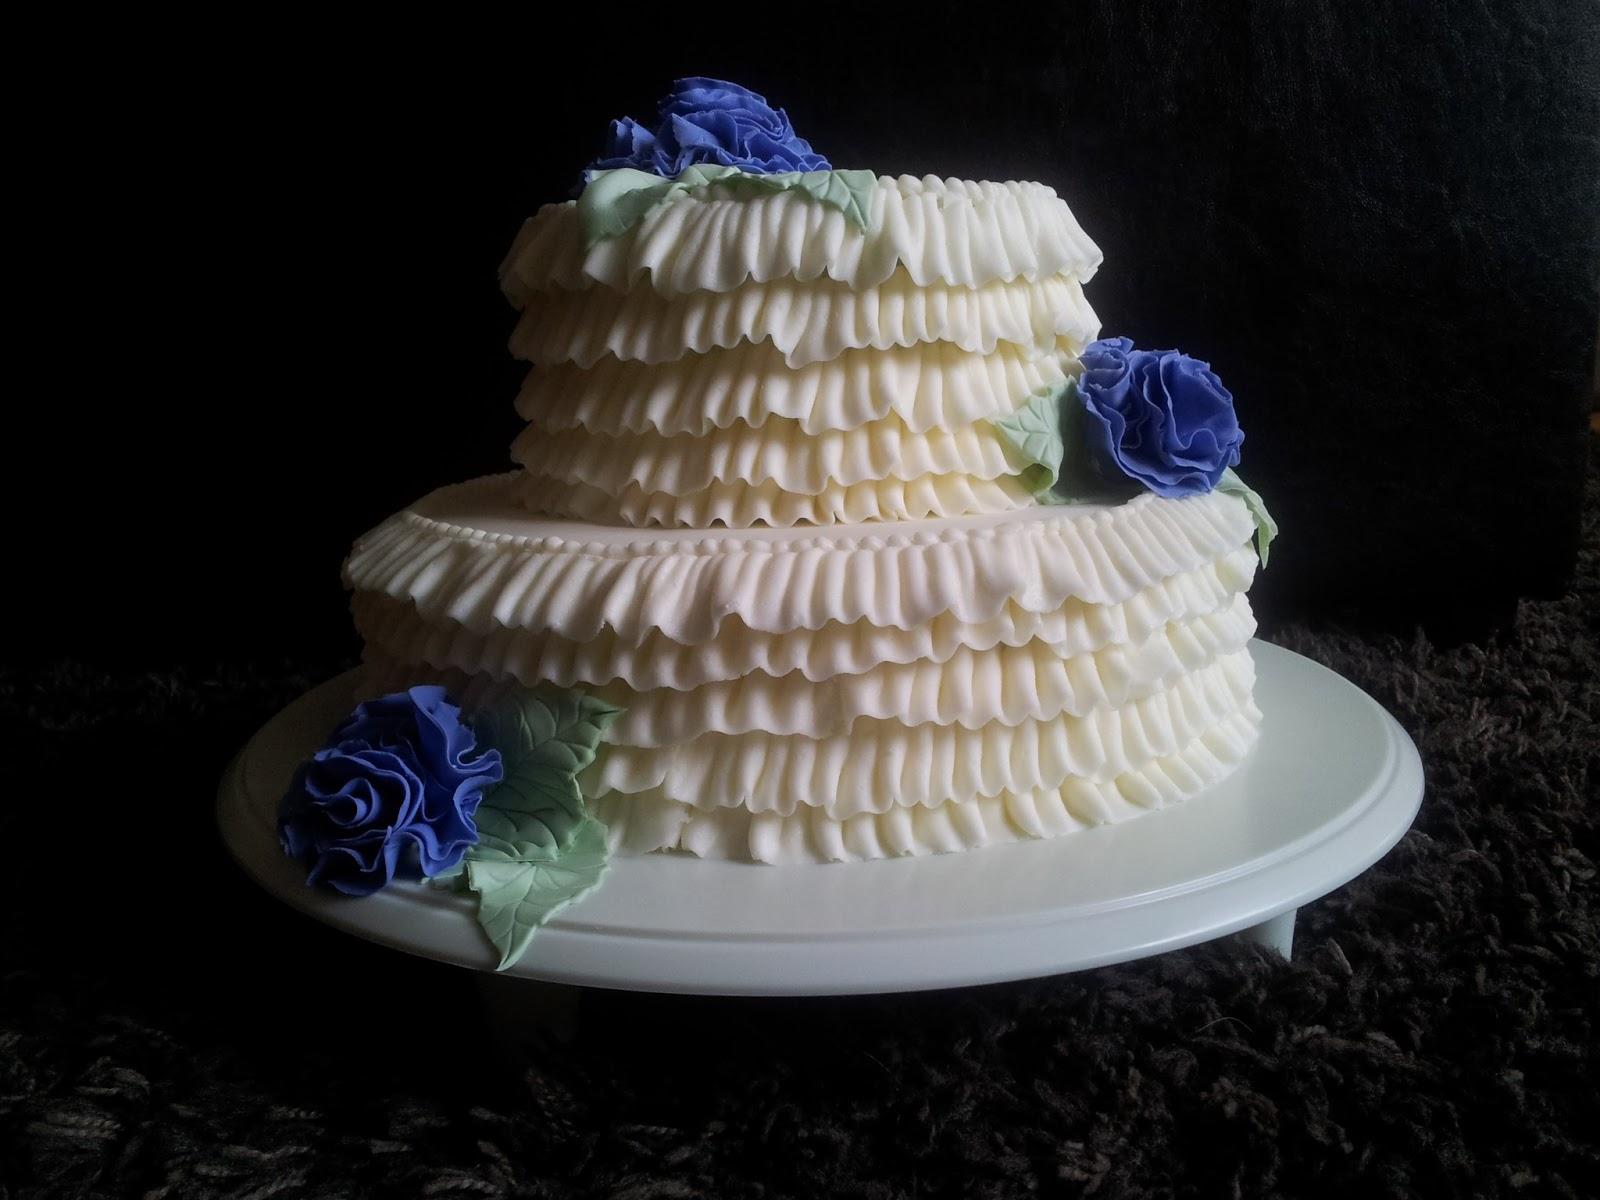 163 199 on pinterest cake charlotte nc 28278 usa charlotte nc 28278